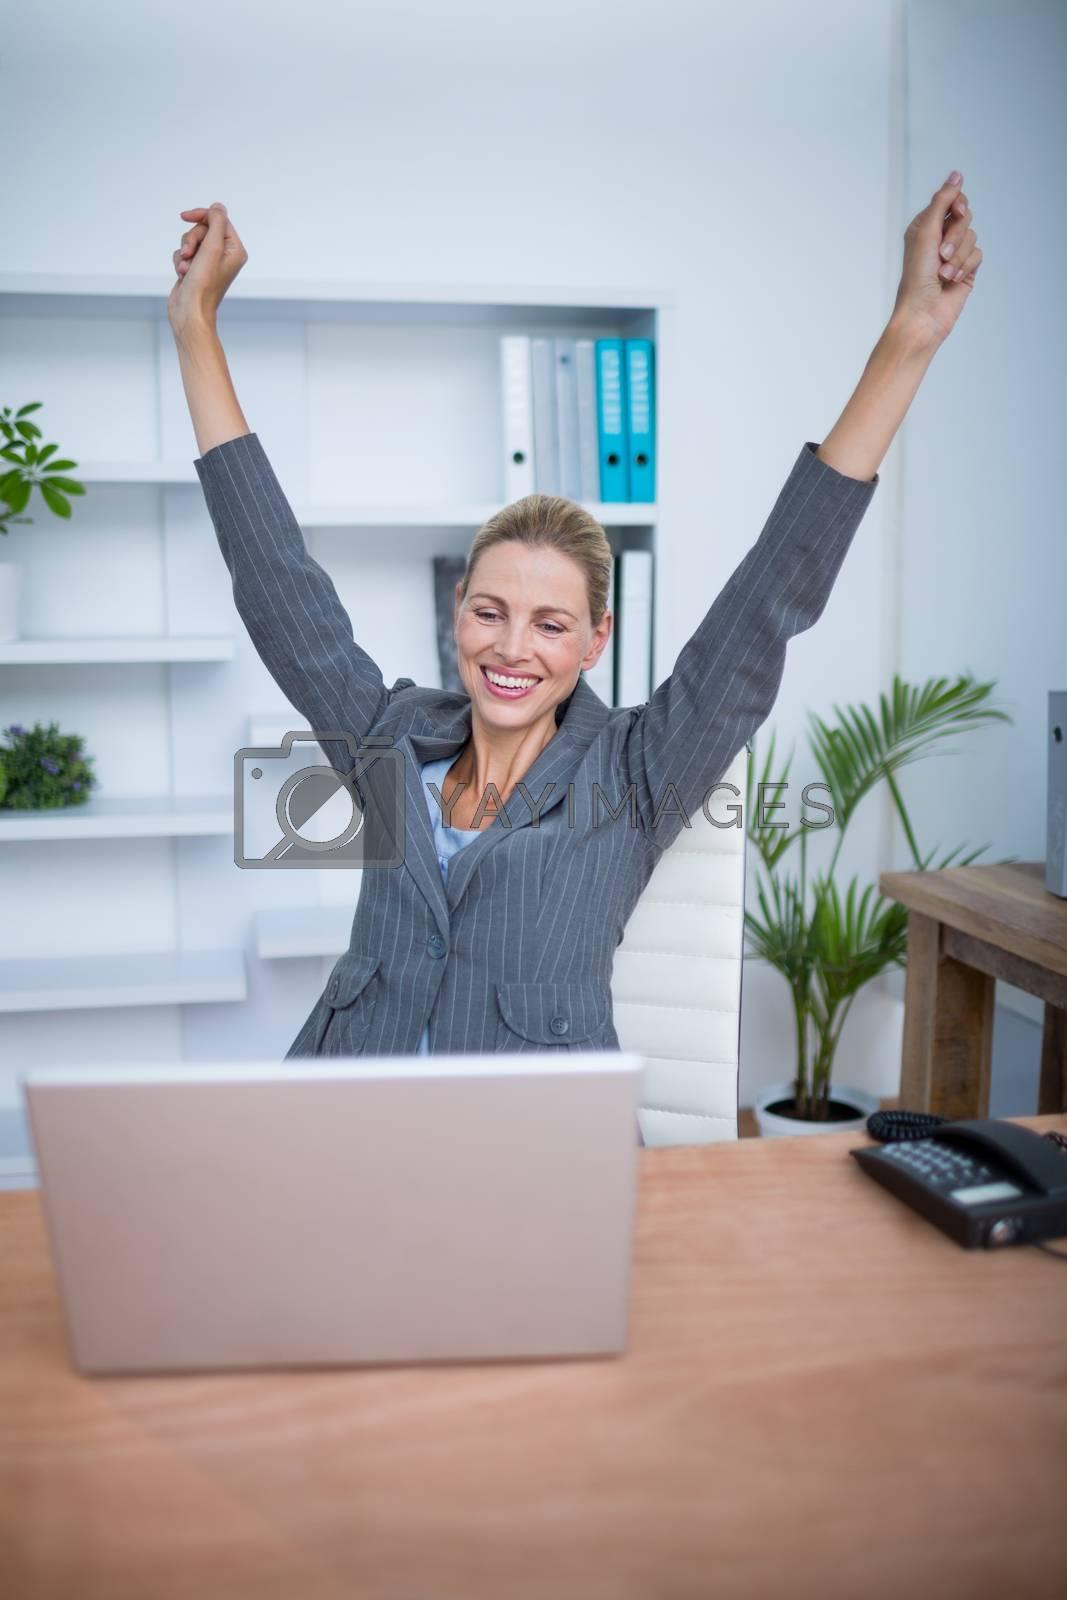 Royalty free image of Pretty blonde businesswoman gesturing victory by Wavebreakmedia